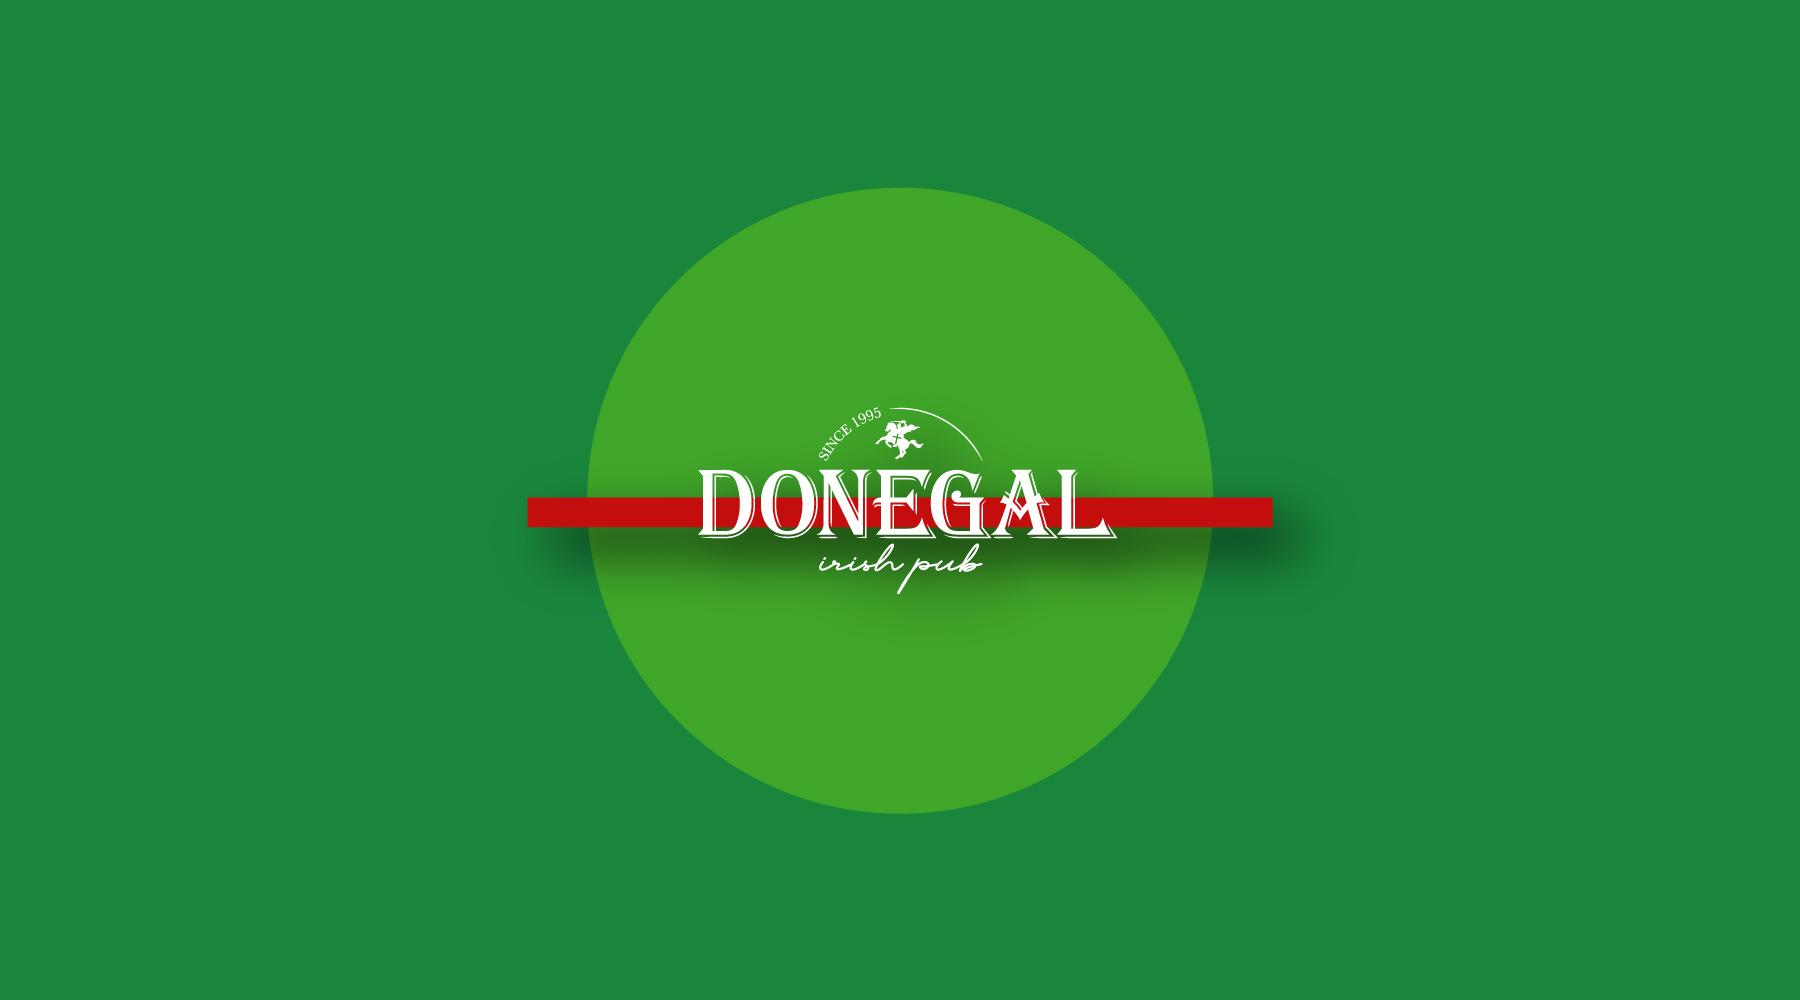 donegal-ancona-pub-hero